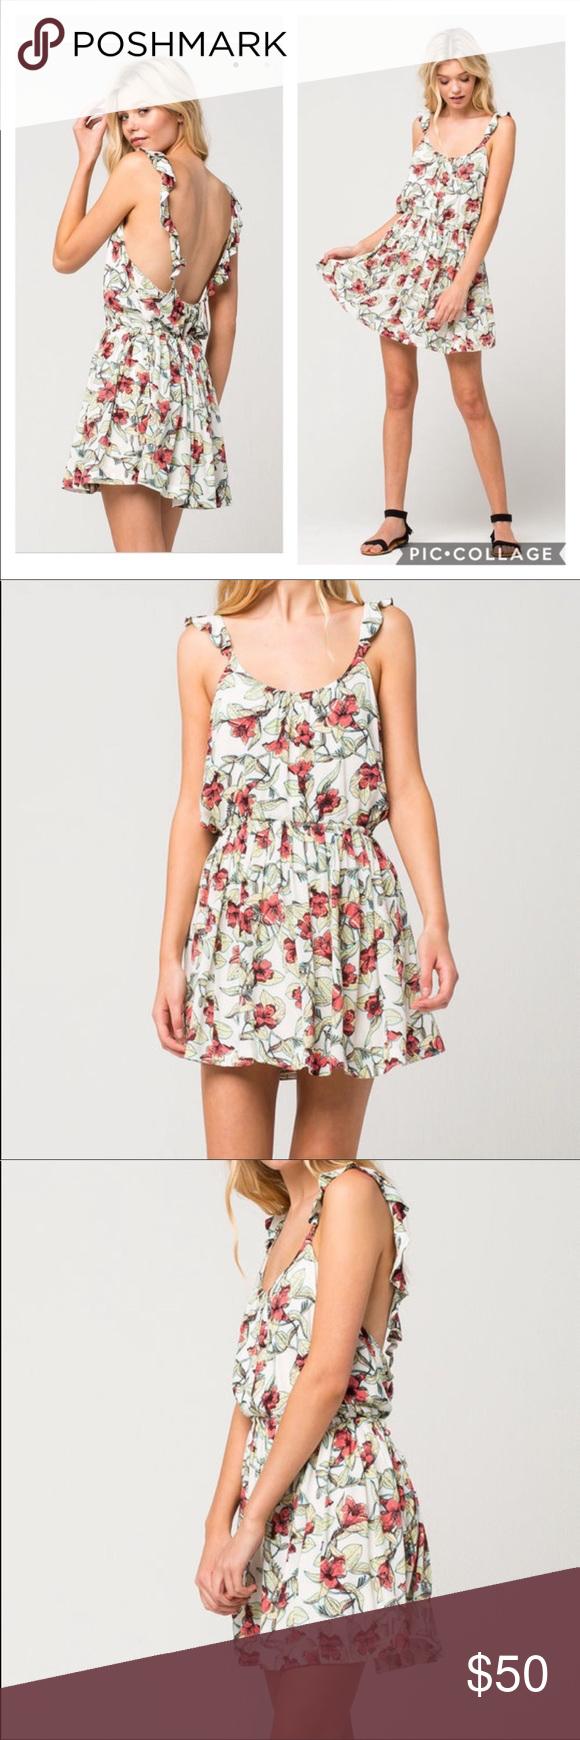 f036957152fb Free People White Floral Ruffle Mini Dress Large Free People Dear You Mini  Dress Size Large